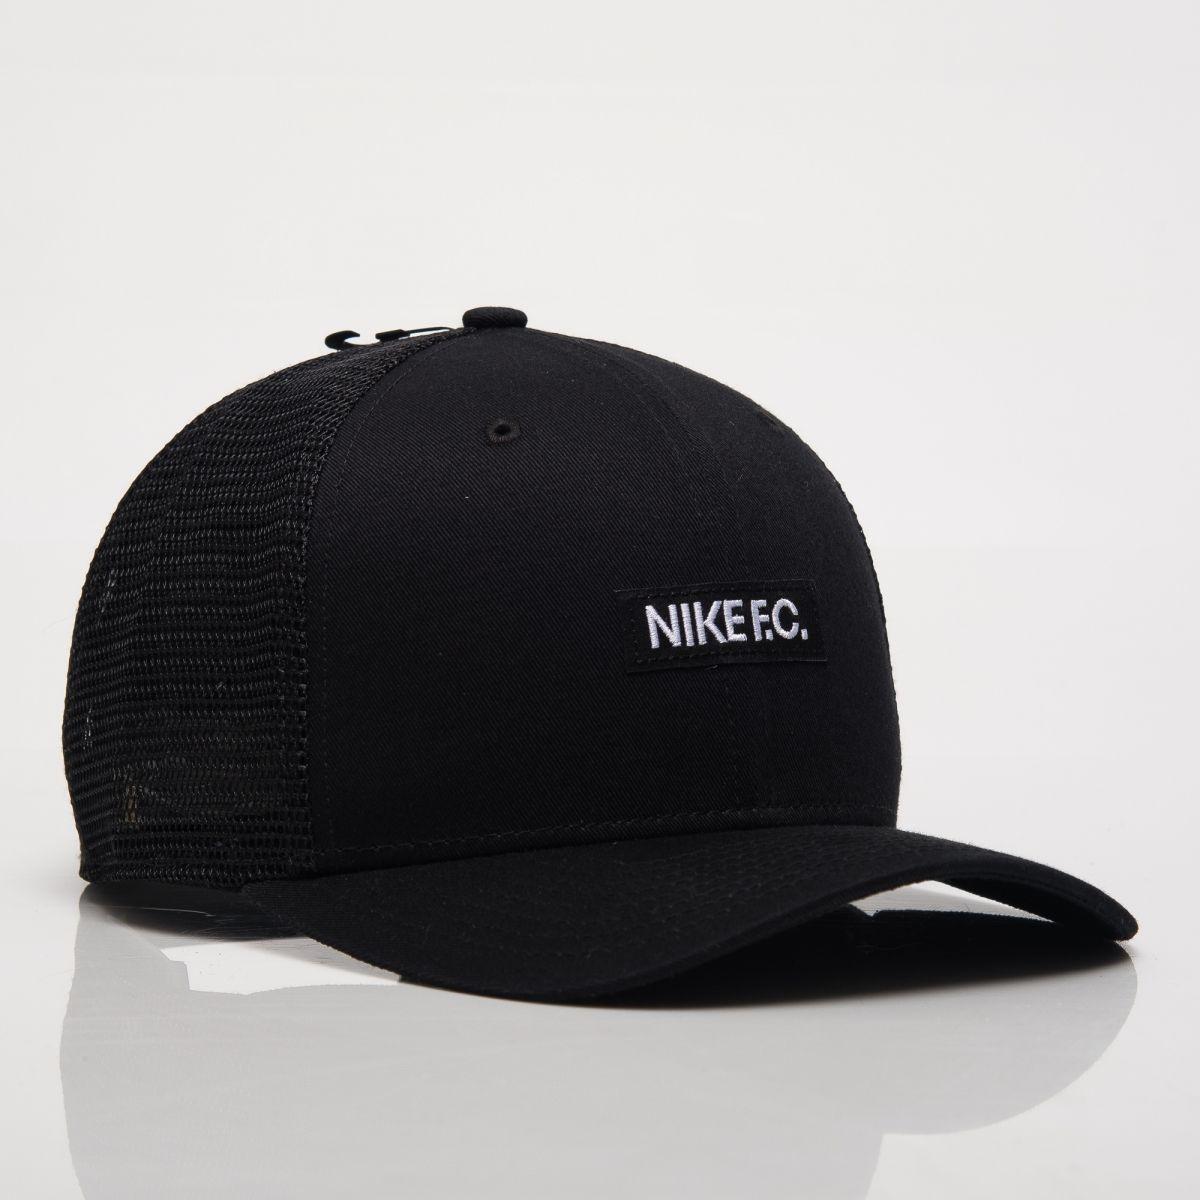 30b135144 Type Caps Nike F.C. Classic 99 Adjustable Hat